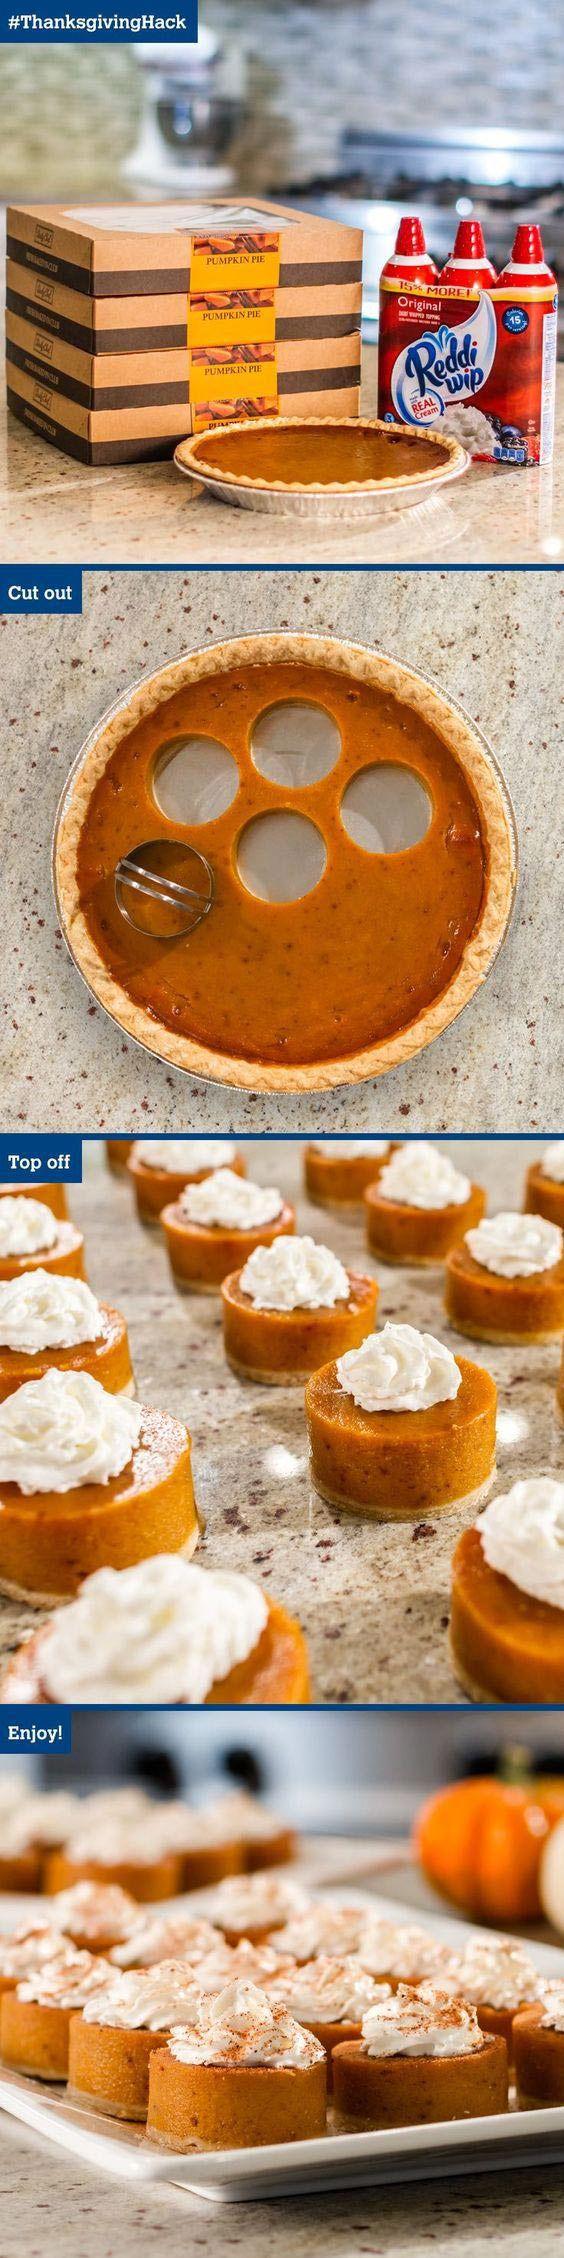 Pumpkin Pie Bites // Small Sweets for a Dessert Reception - weddingfor1000.com